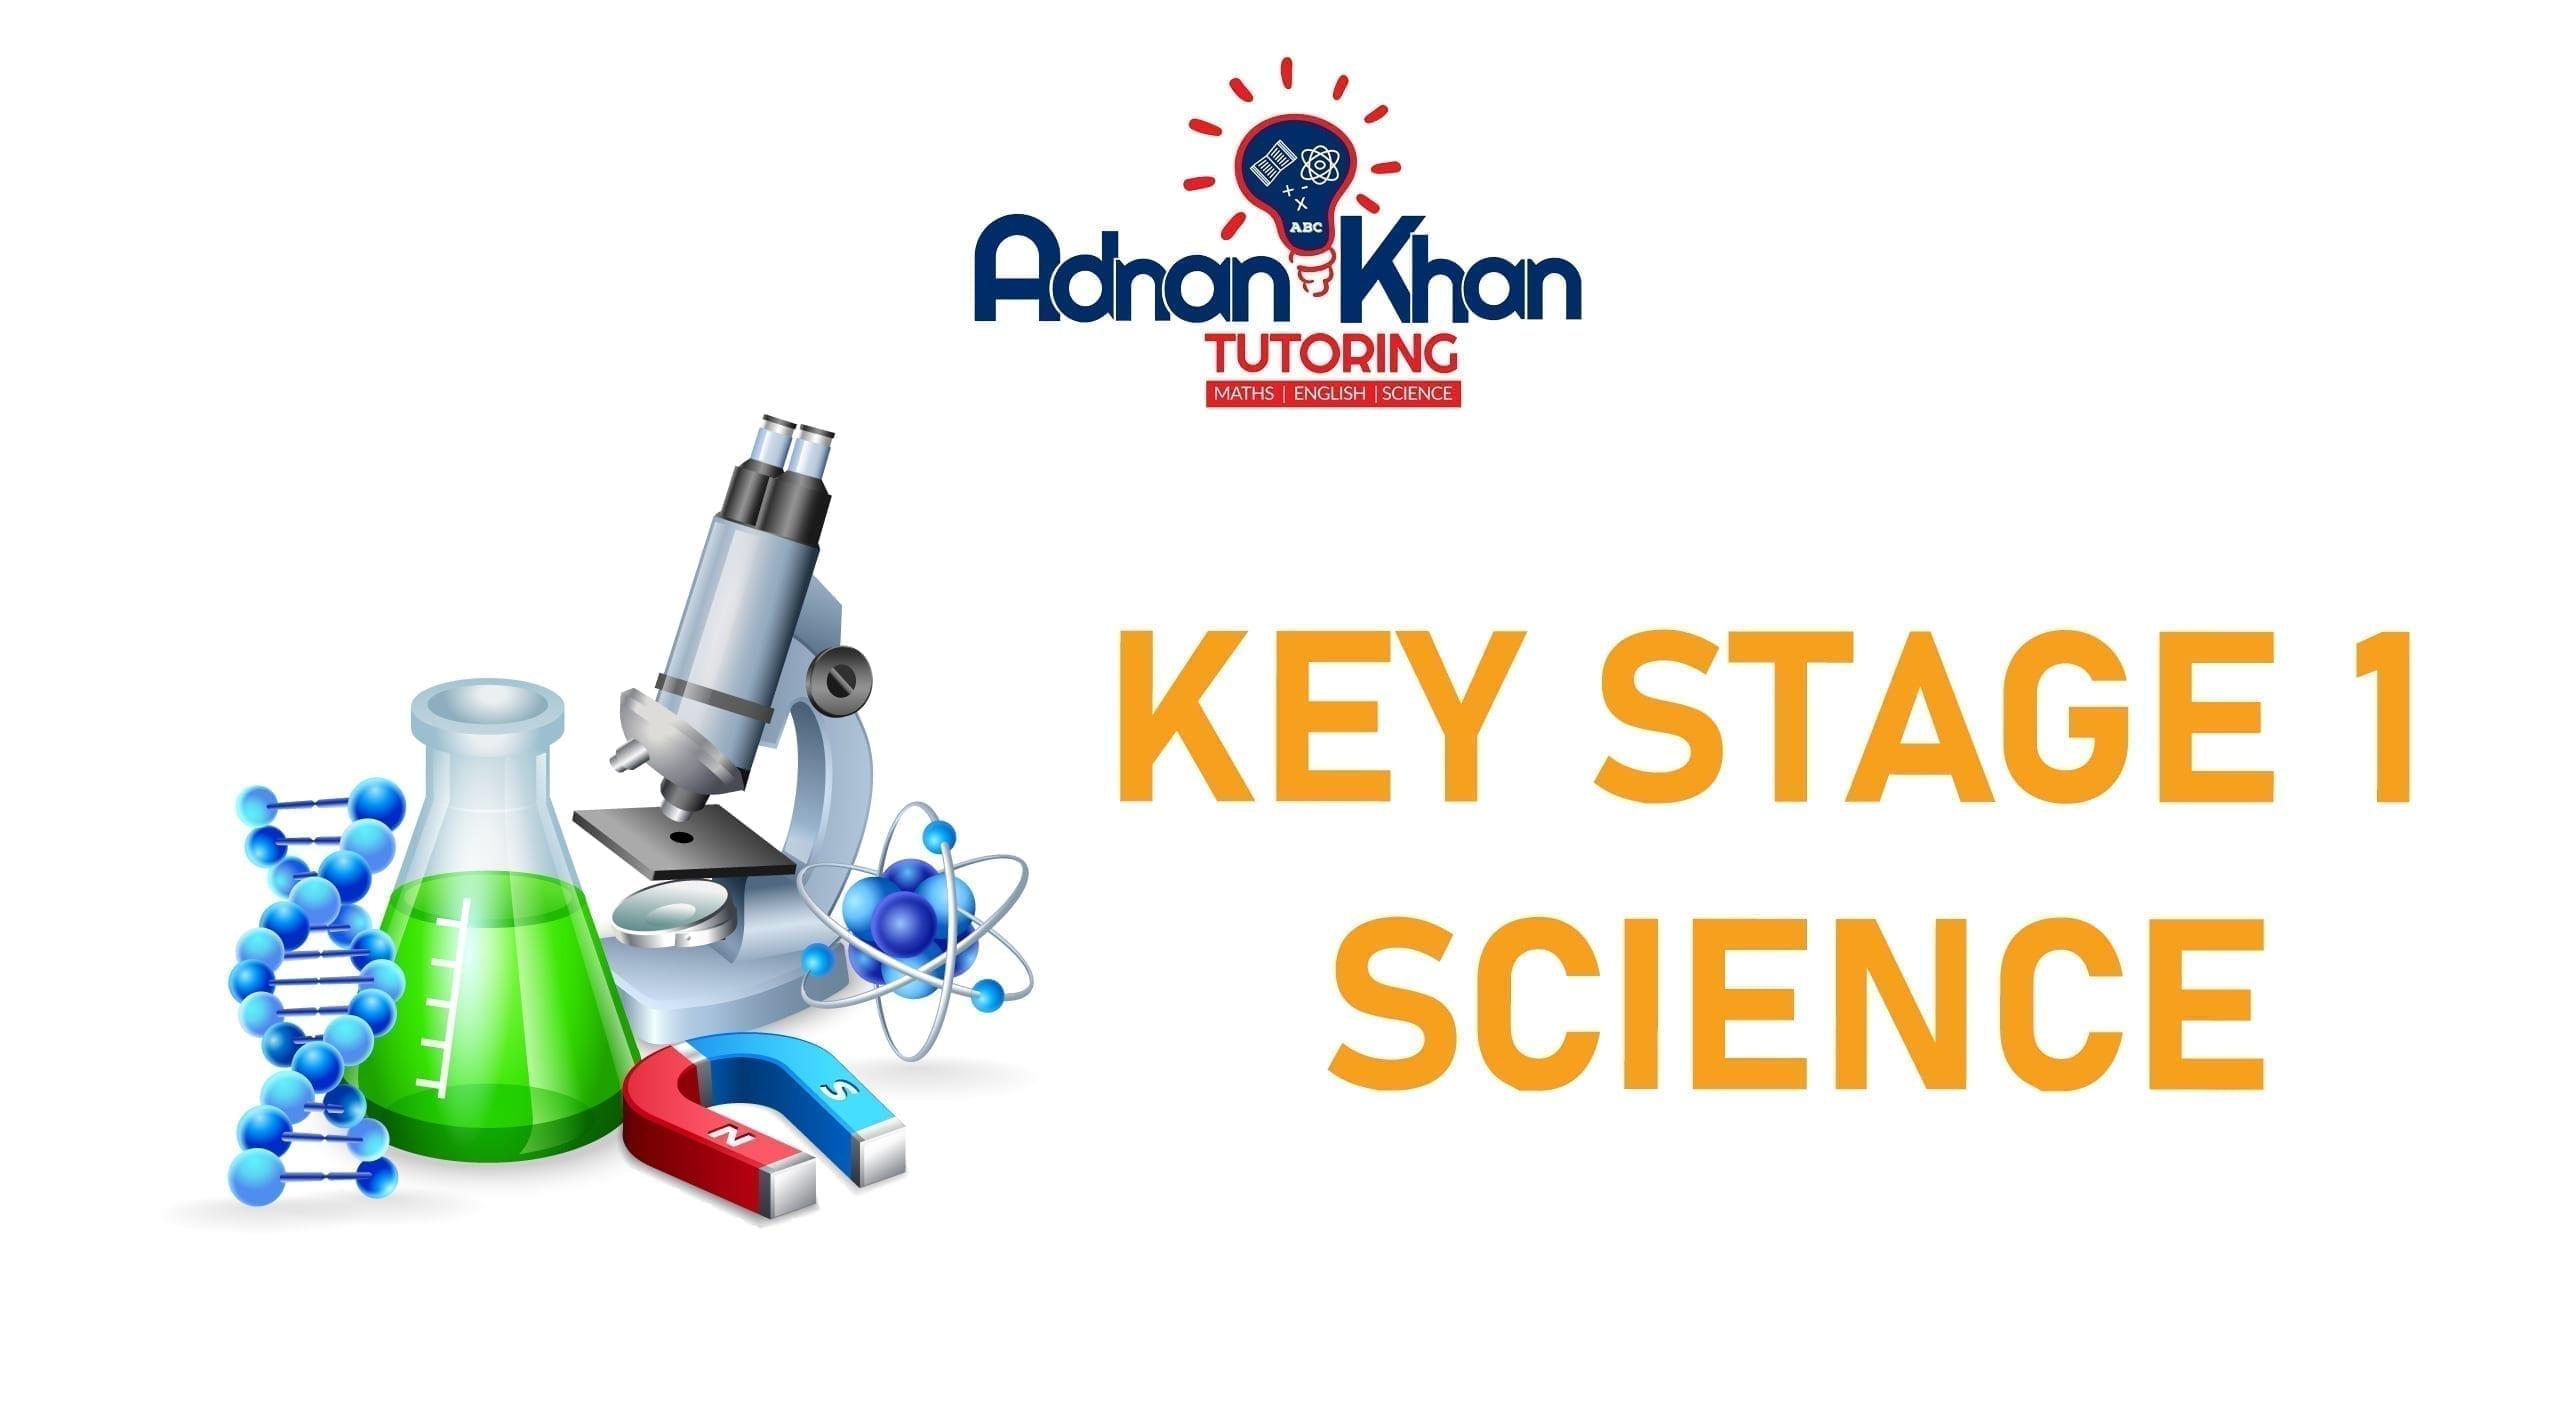 ks1_science_featuredimage_08-12-2020_adnankhantutoring.co_.uk_